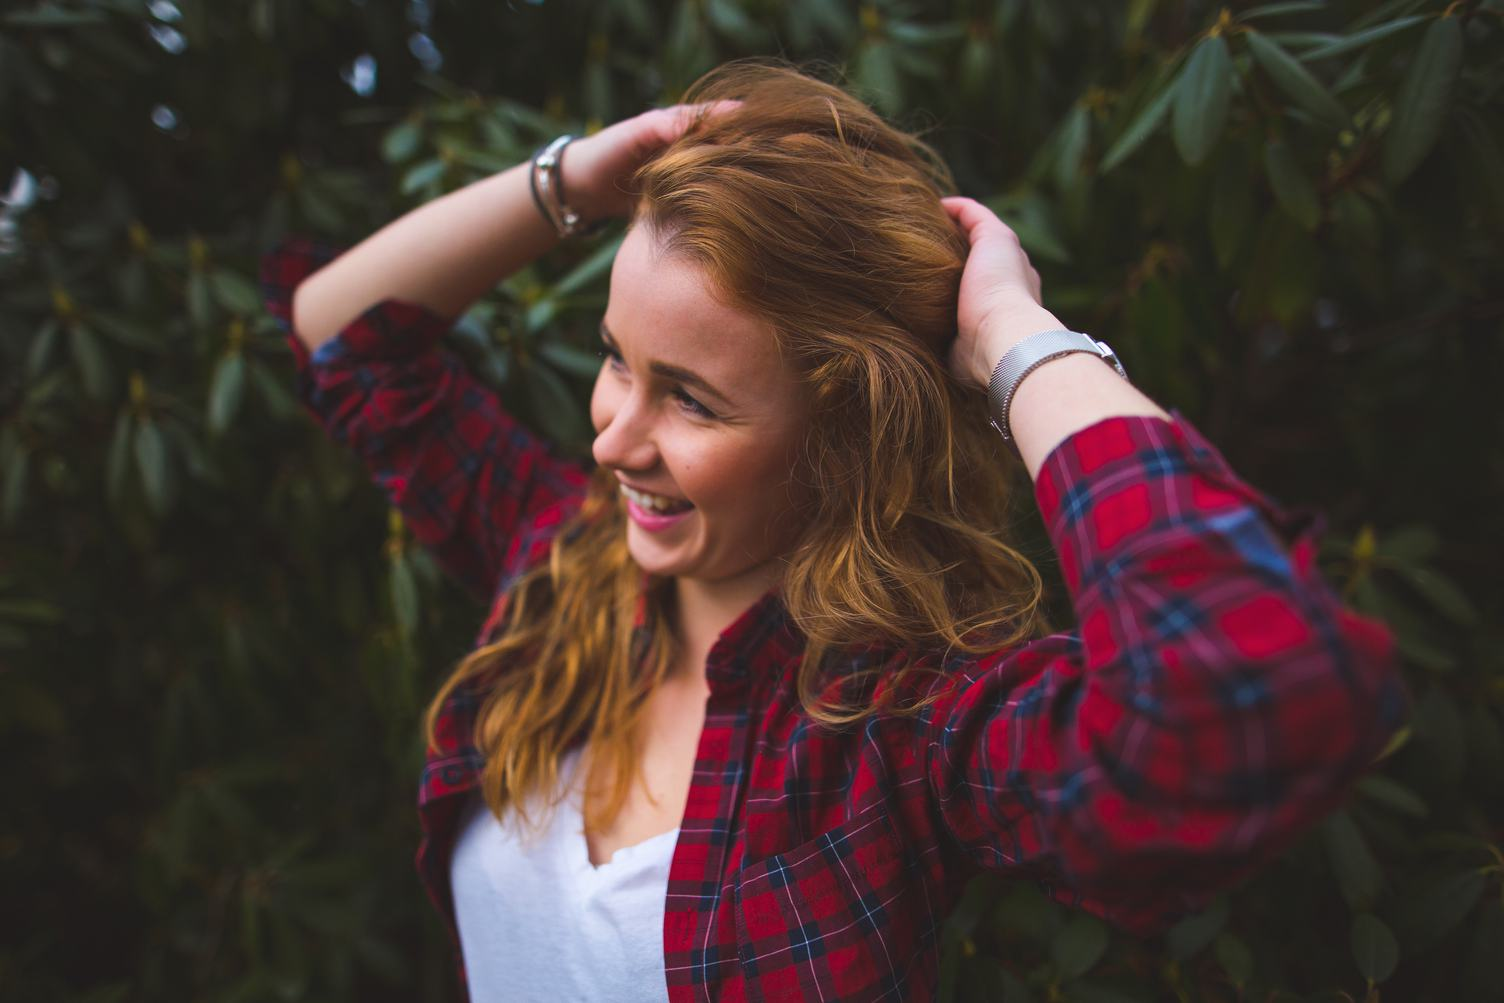 Portrait of a Happy Redhead Girl in Plaid Shirt